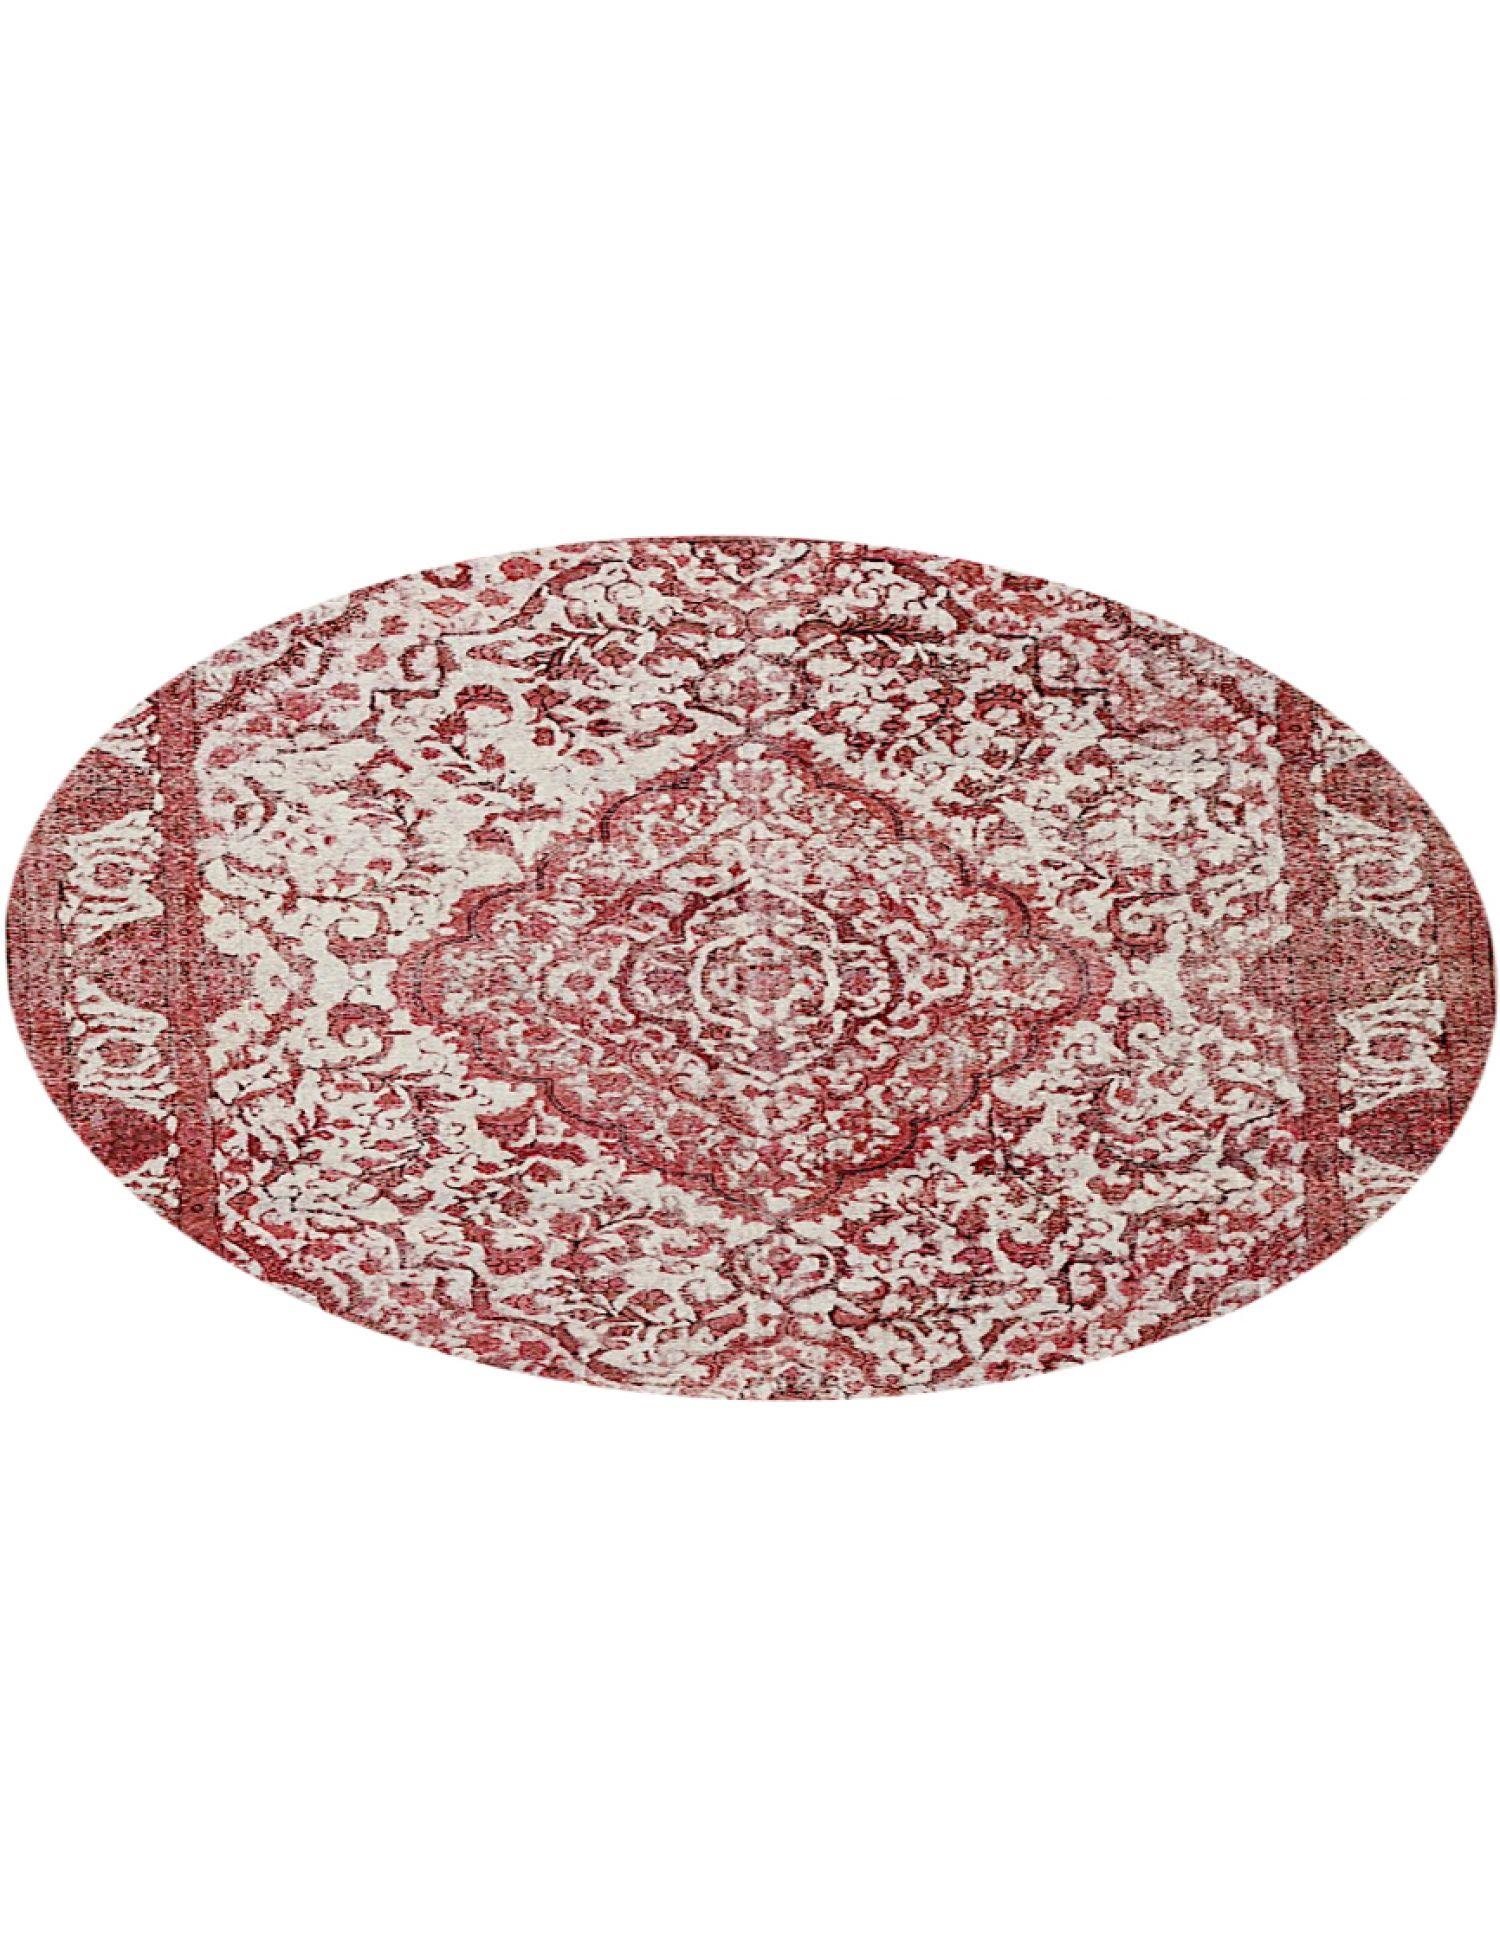 Tappeto Vintage  rosso <br/>296 x 296 cm